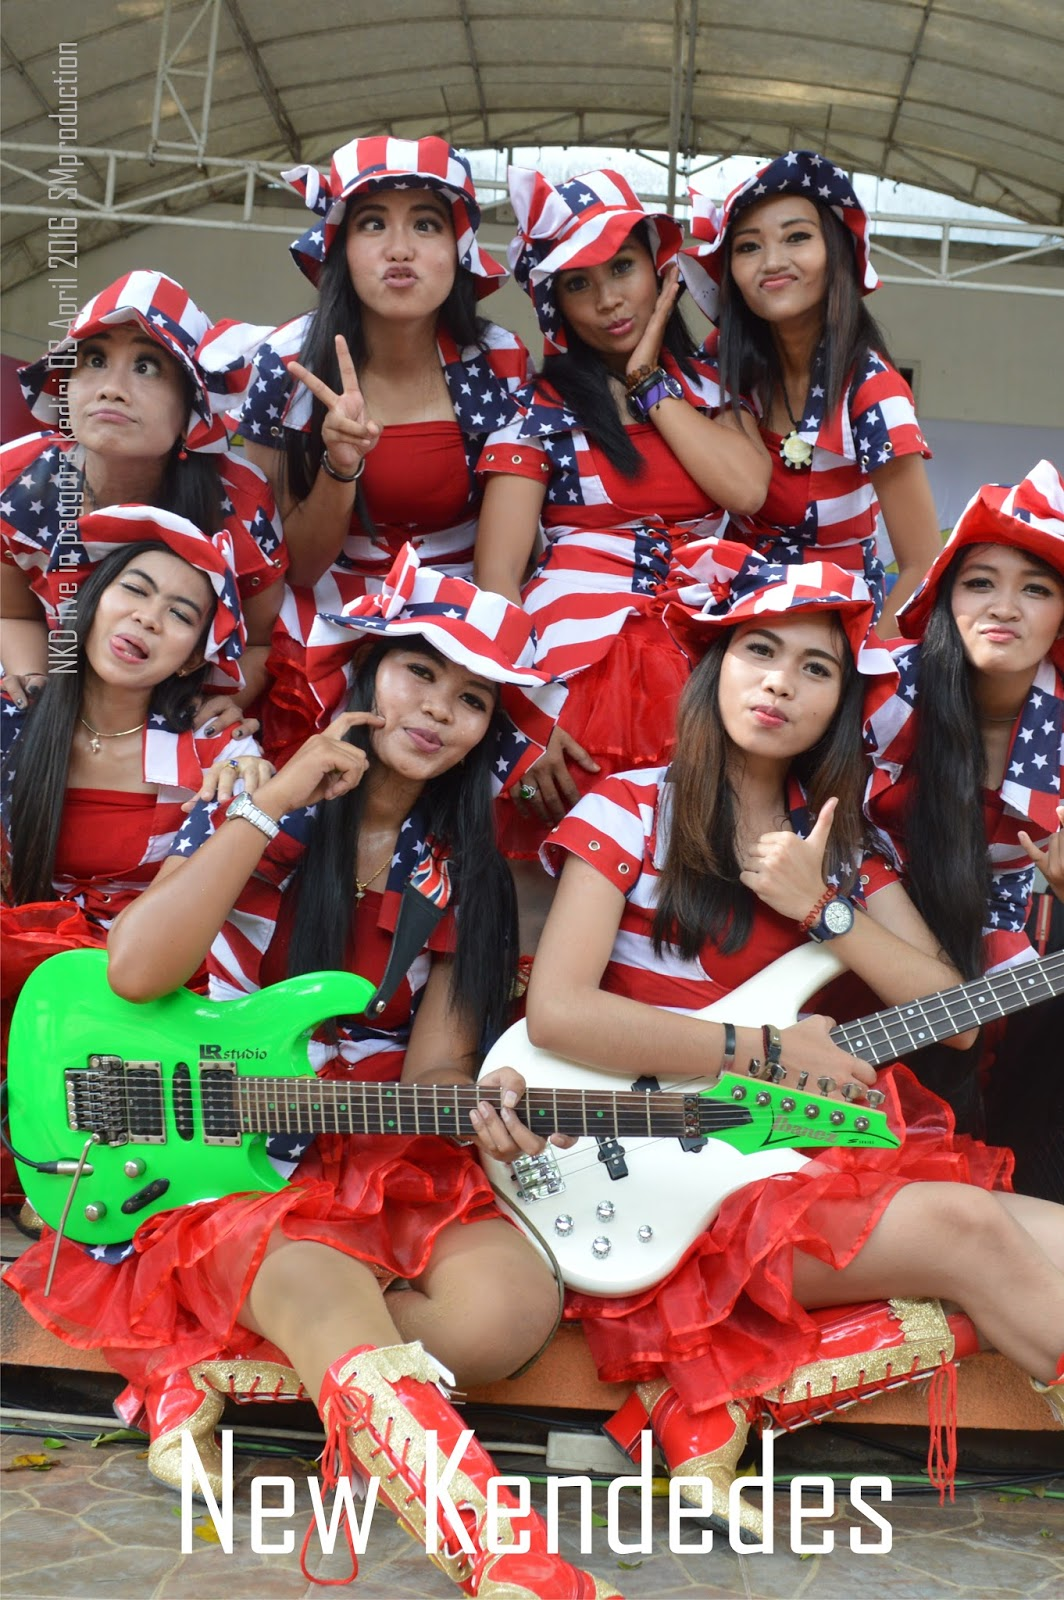 Download Mp4 New Kendedes : download, kendedes, Oyongbae:, Kumpulan, Album, Kendedes, Terbaru, Gratis